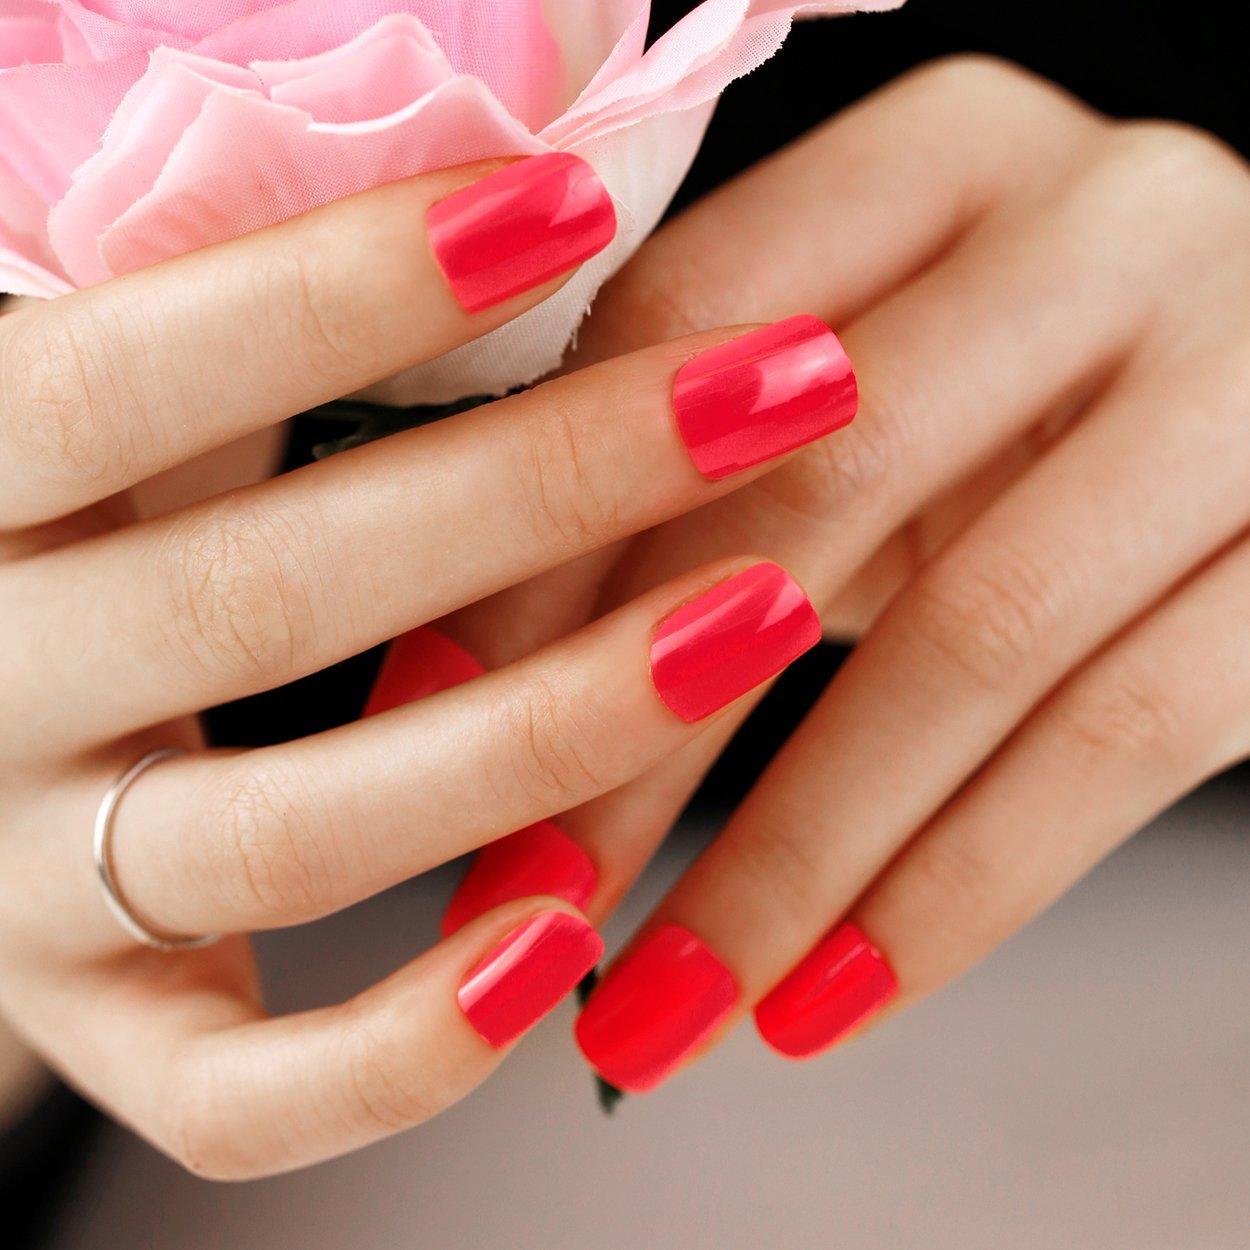 Buy Art Plus 24pcs Rose Red False Nails Set French Manicure Full ...